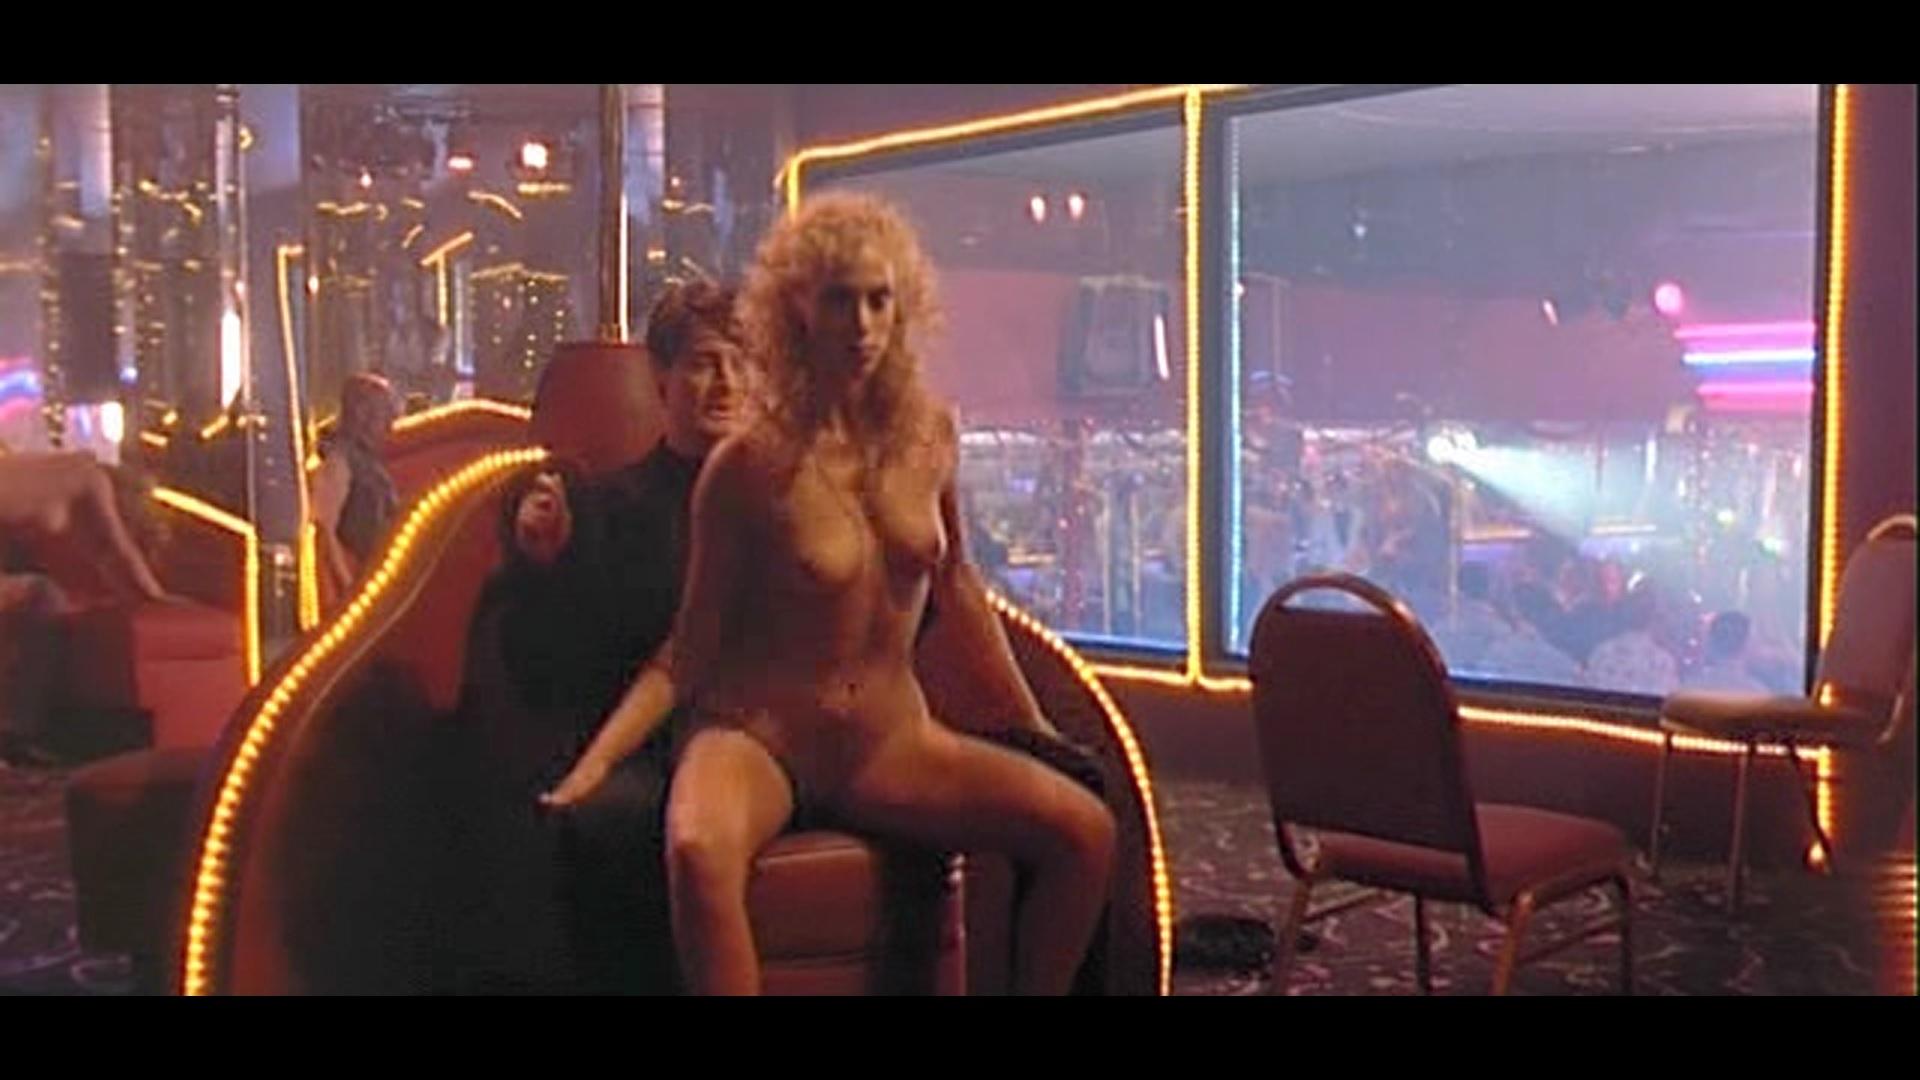 Showgirls pussy nude elizabeth berkley